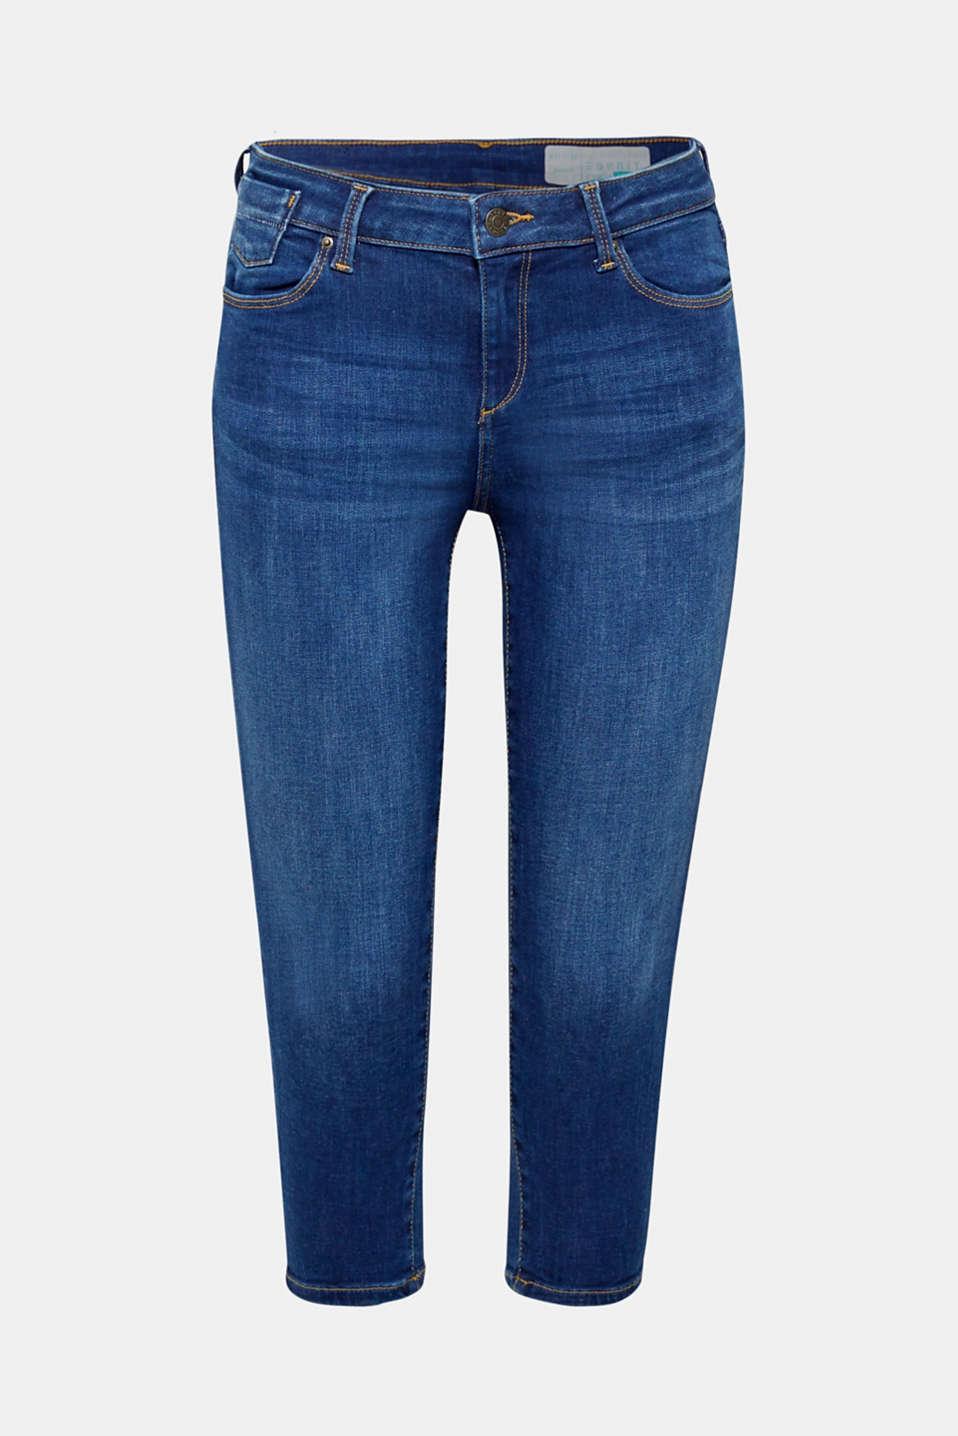 Pants denim, BLUE MEDIUM WASH, detail image number 8